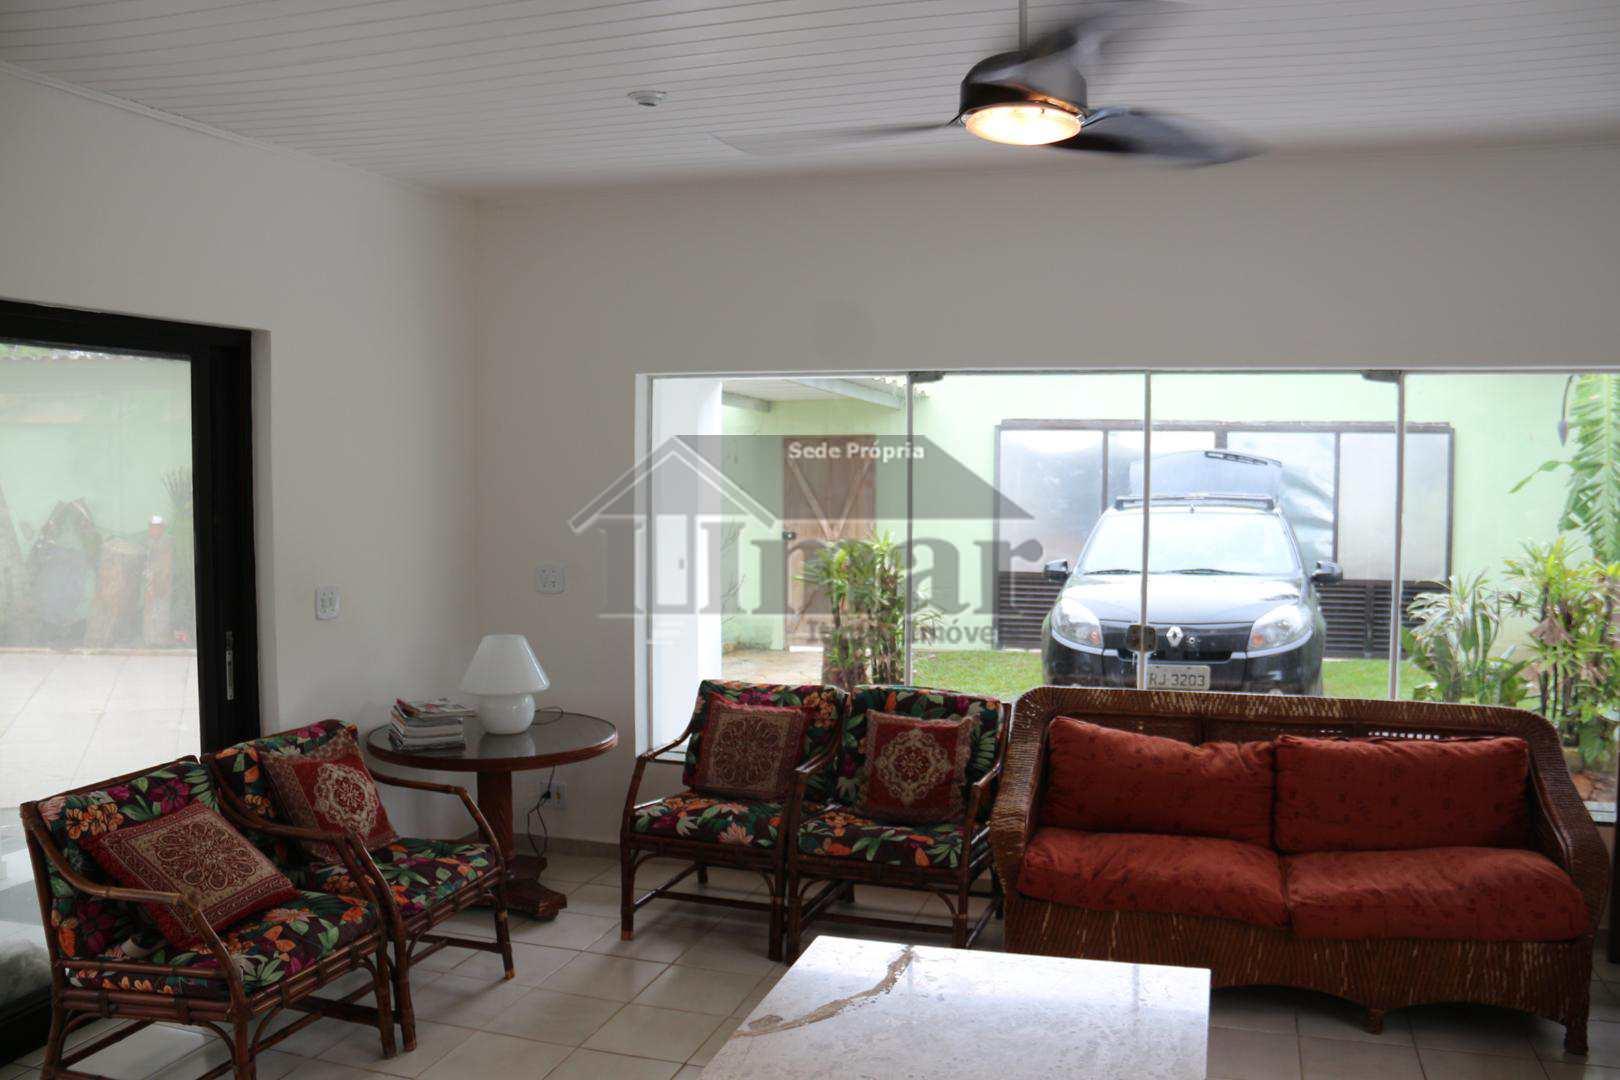 Casa com 4 dorms, Jardim Virgínia, Guarujá - R$ 750 mil, Cod: 4934